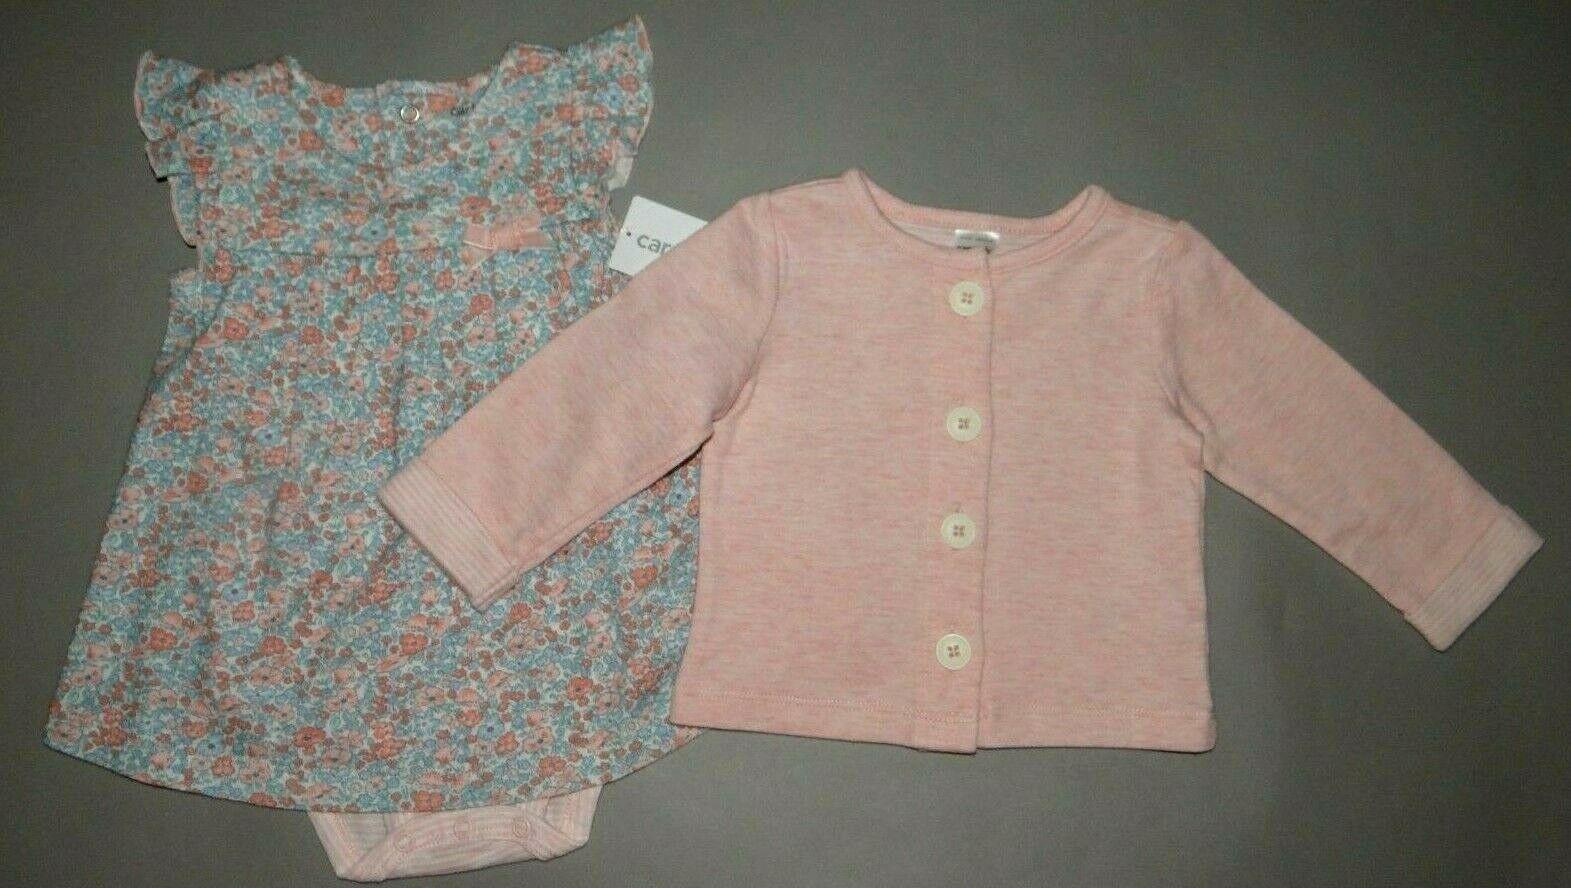 Baby girl clothes, 6 months, Carter's Dress & Cardigan set/